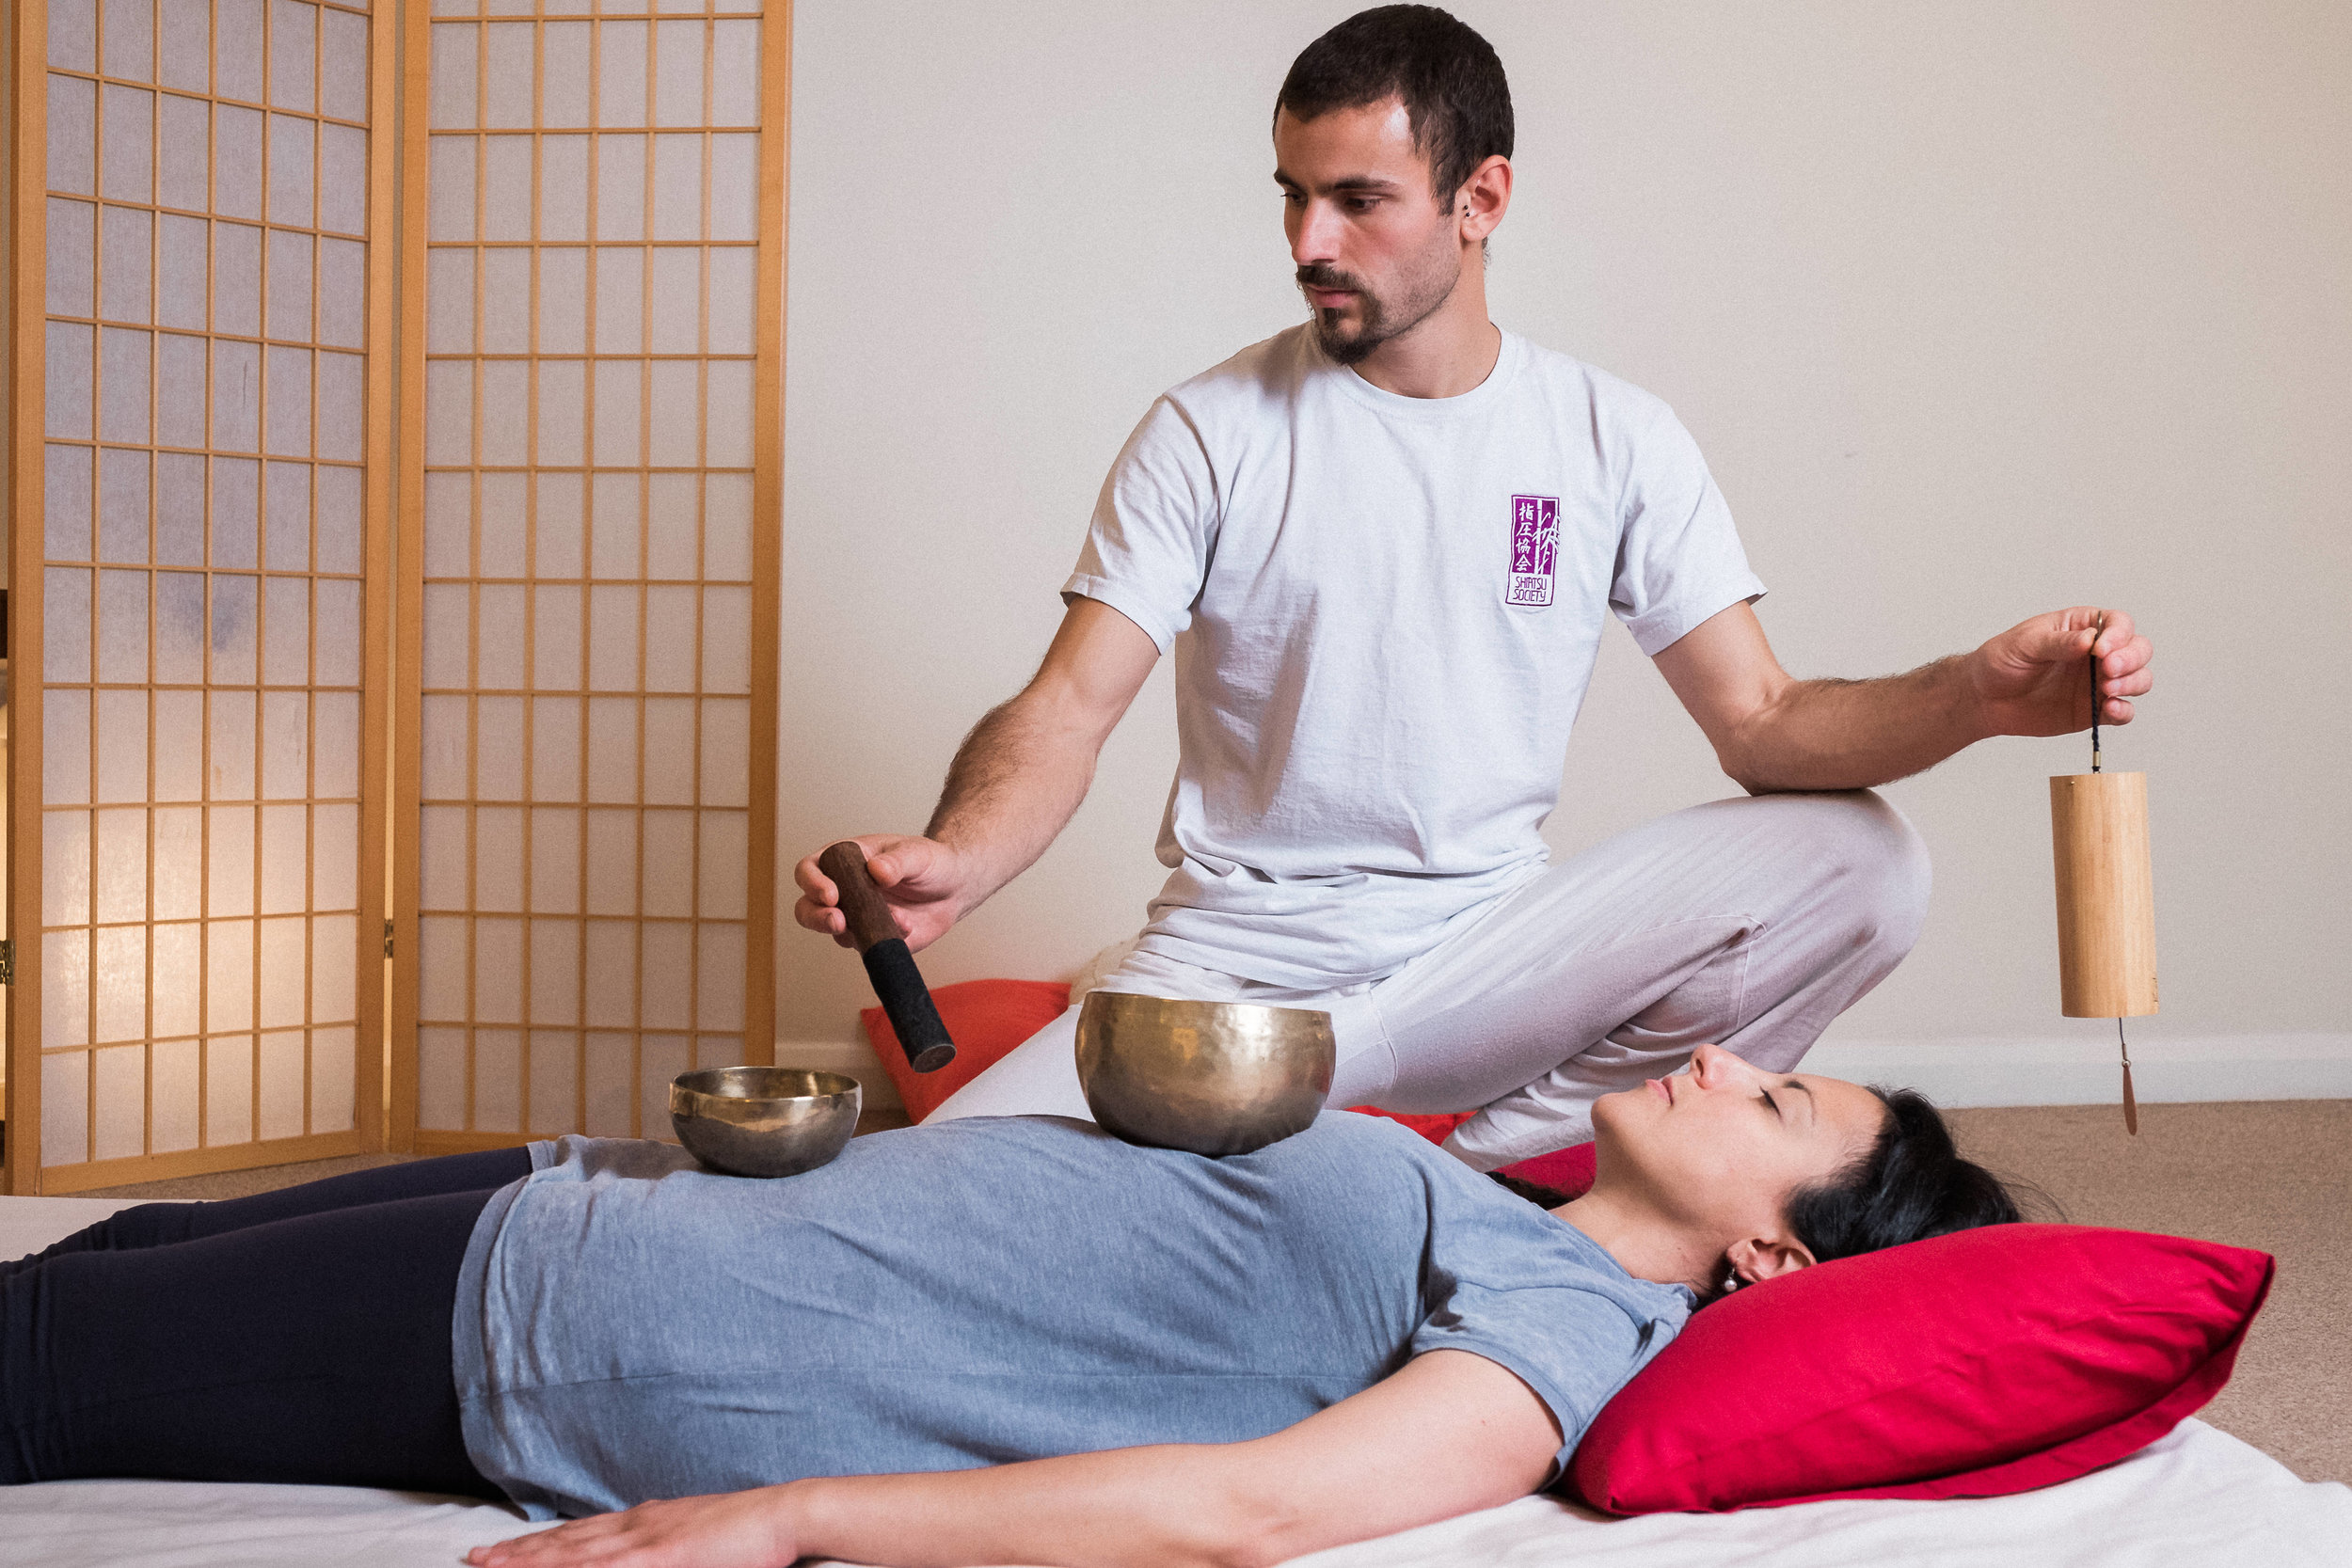 Massage-Edinburgh-Fern-Photography-0034-ZF-2290-64275-1-001-034.jpg